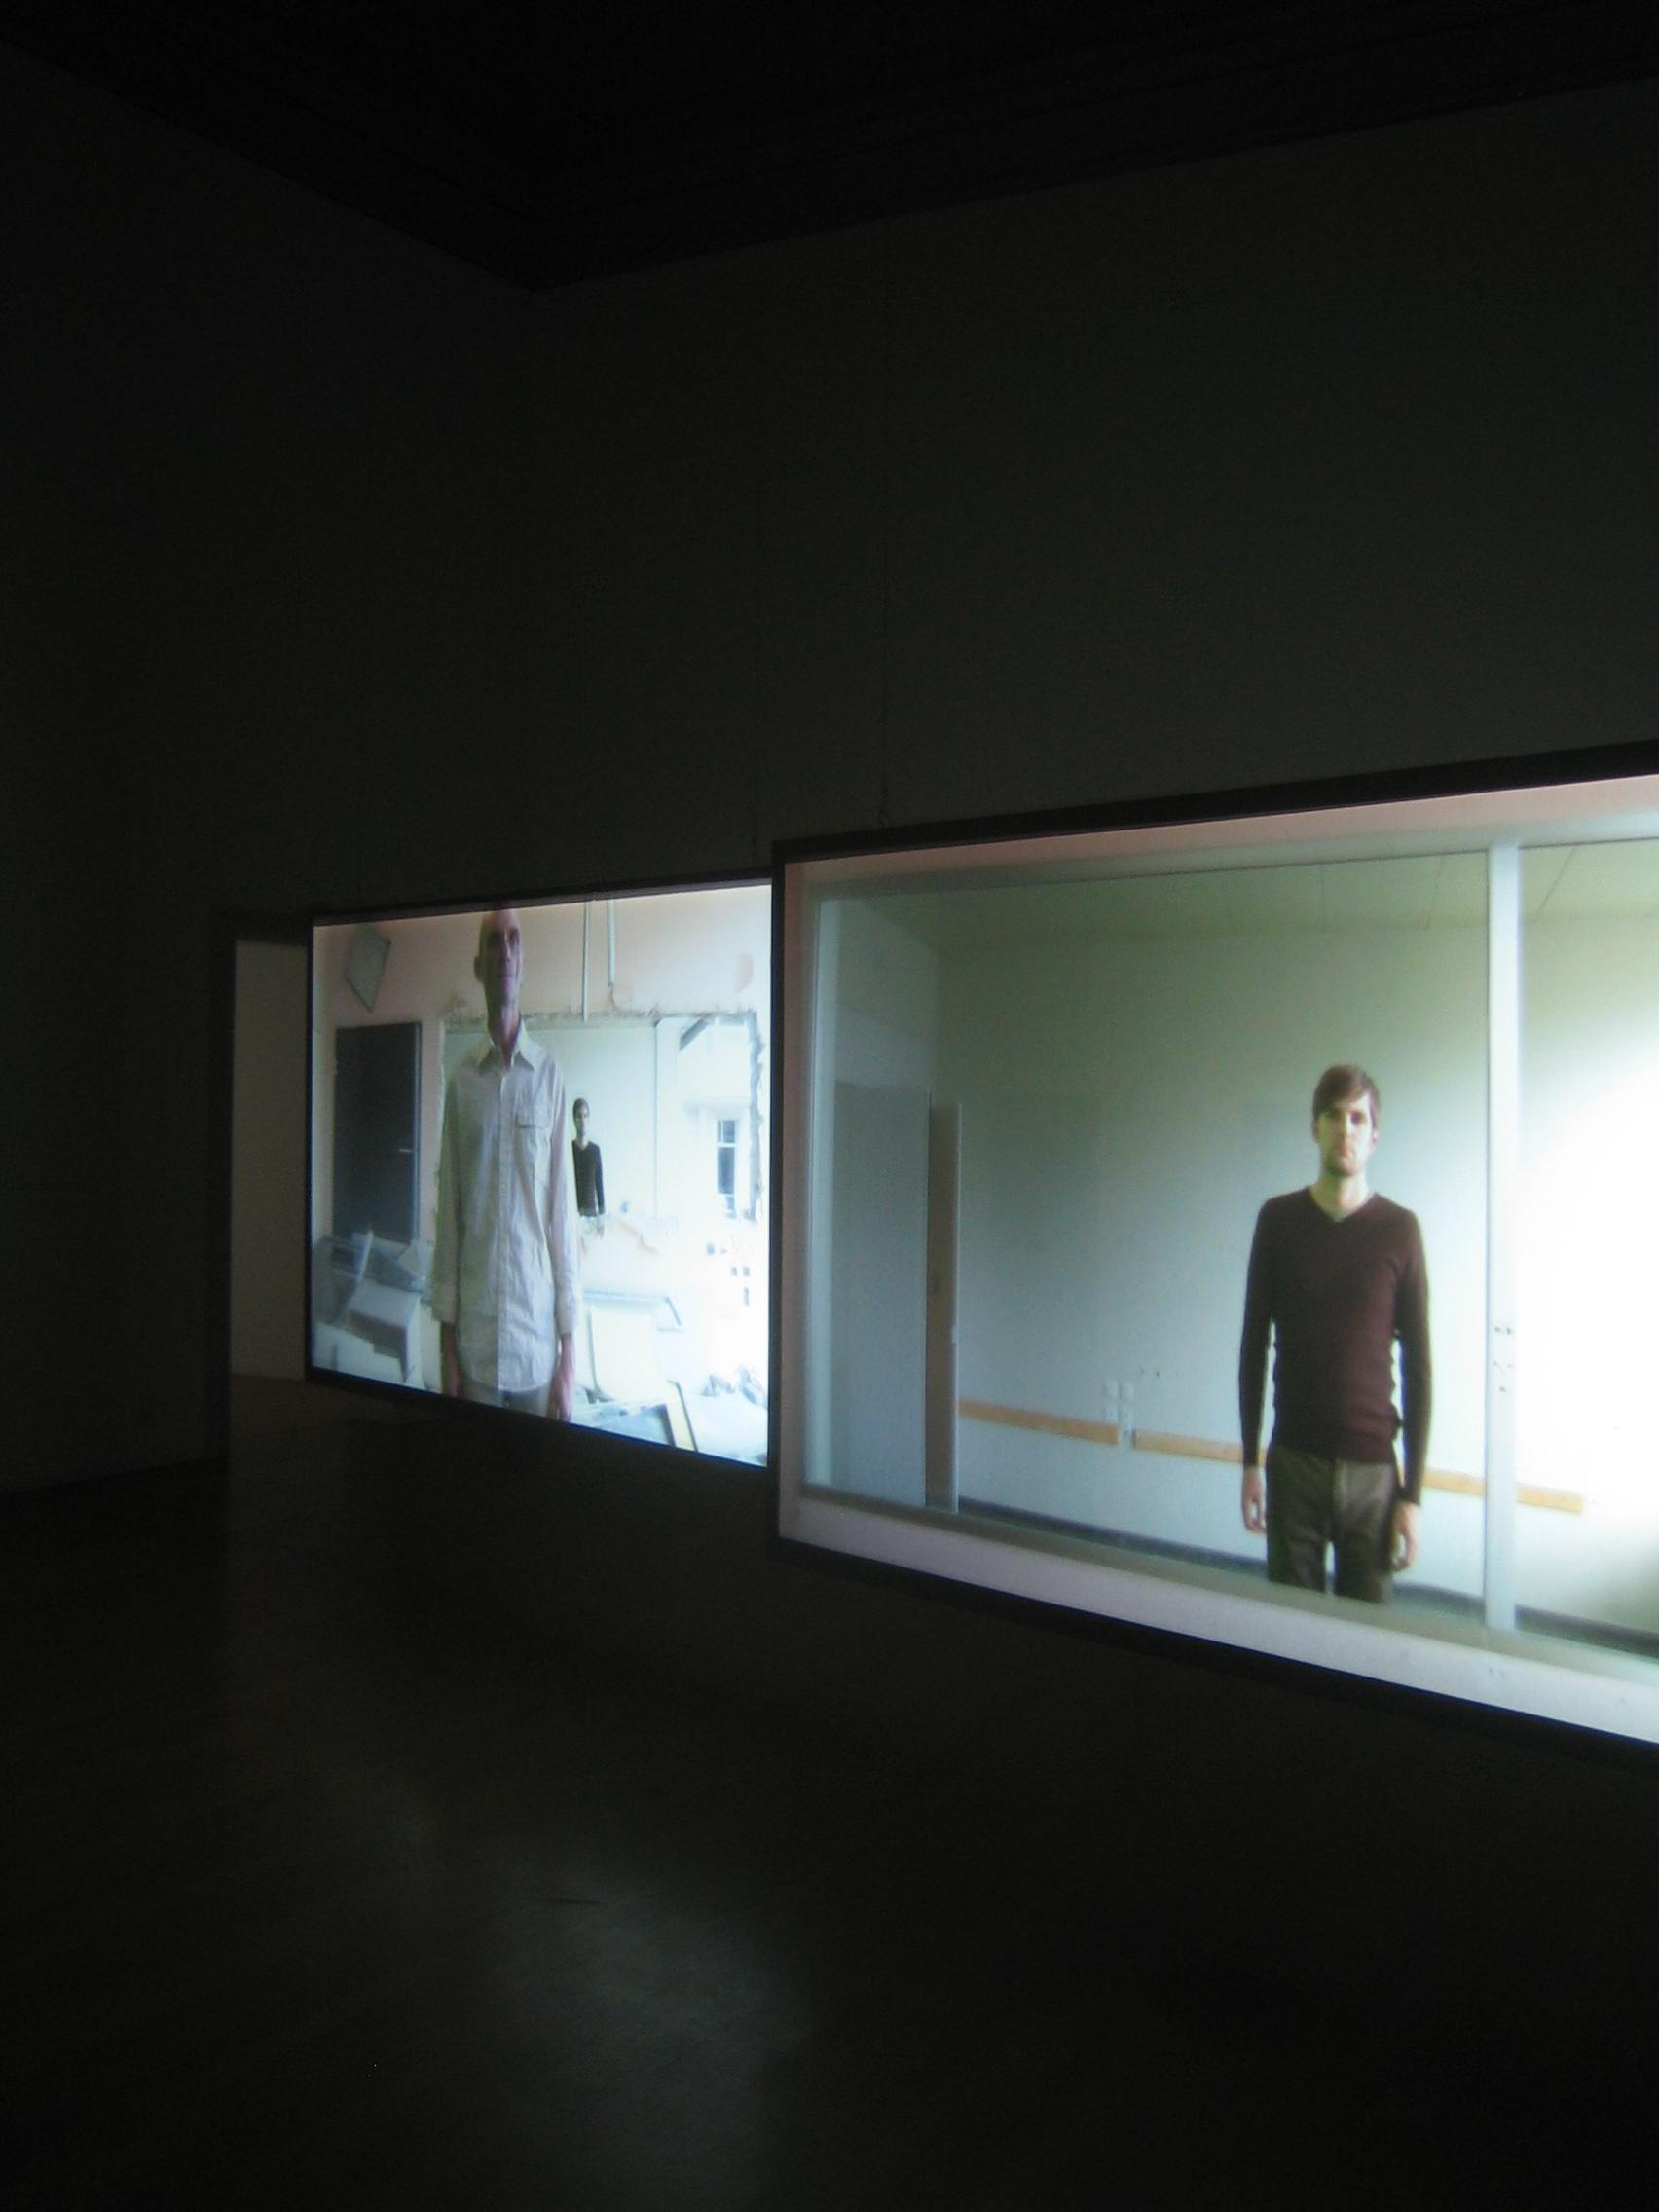 Christoph-Oertli-Kunsthalle-Winterthur-2008-4.JPG